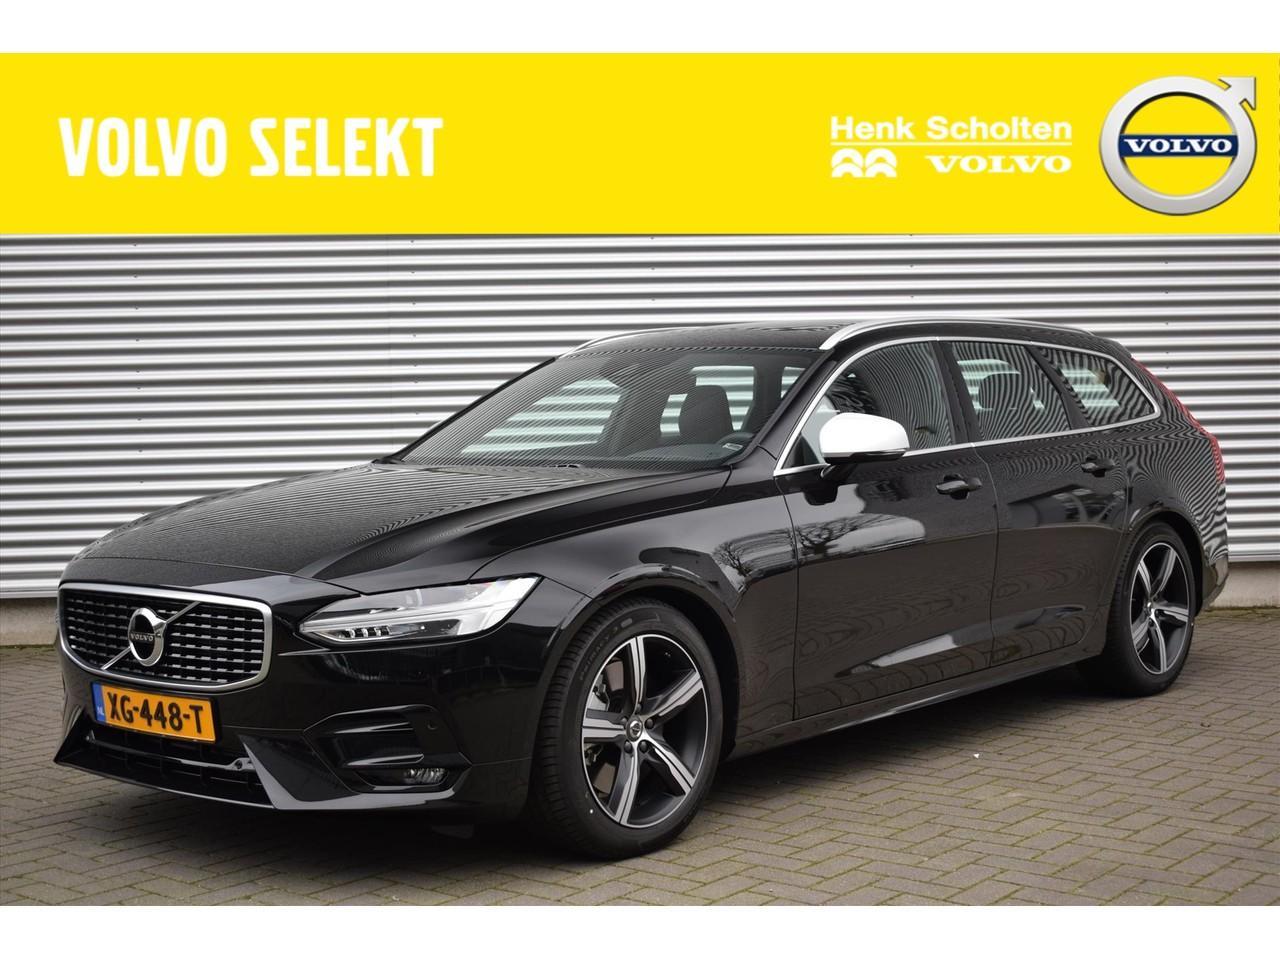 Volvo V90 T4 190pk aut(8) business sport luxury panodak